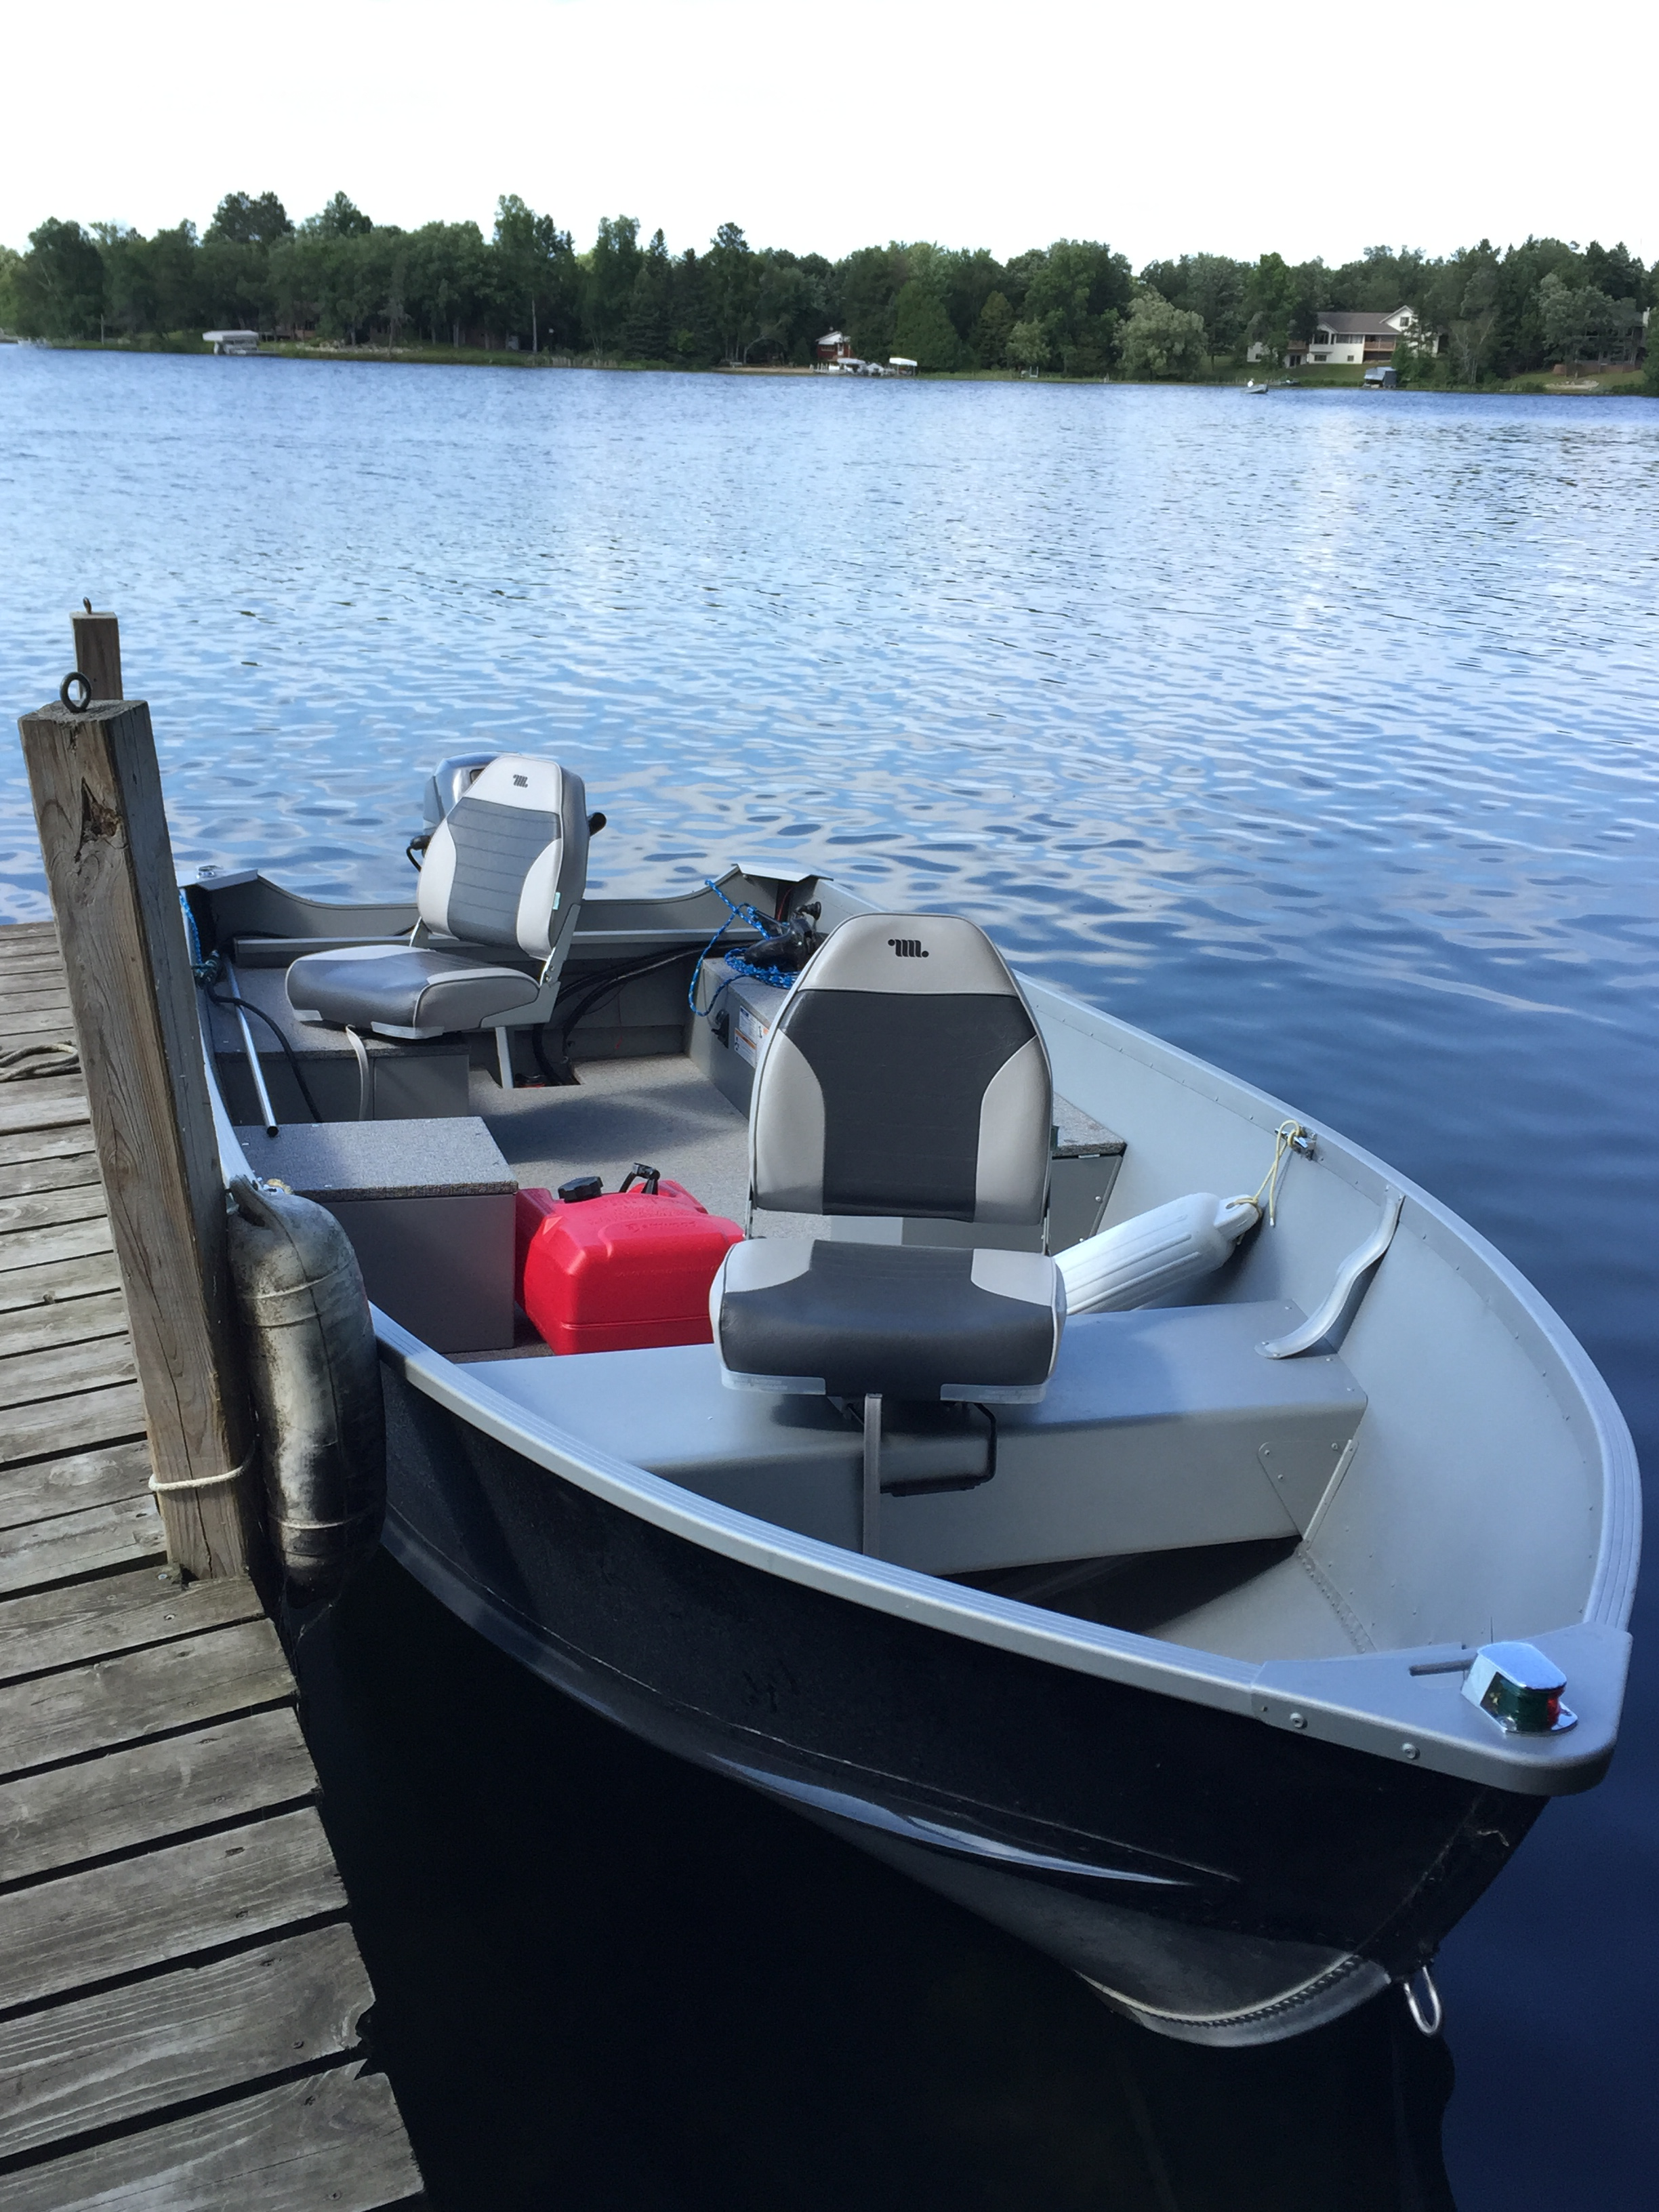 Straight Lake Boat Ren...